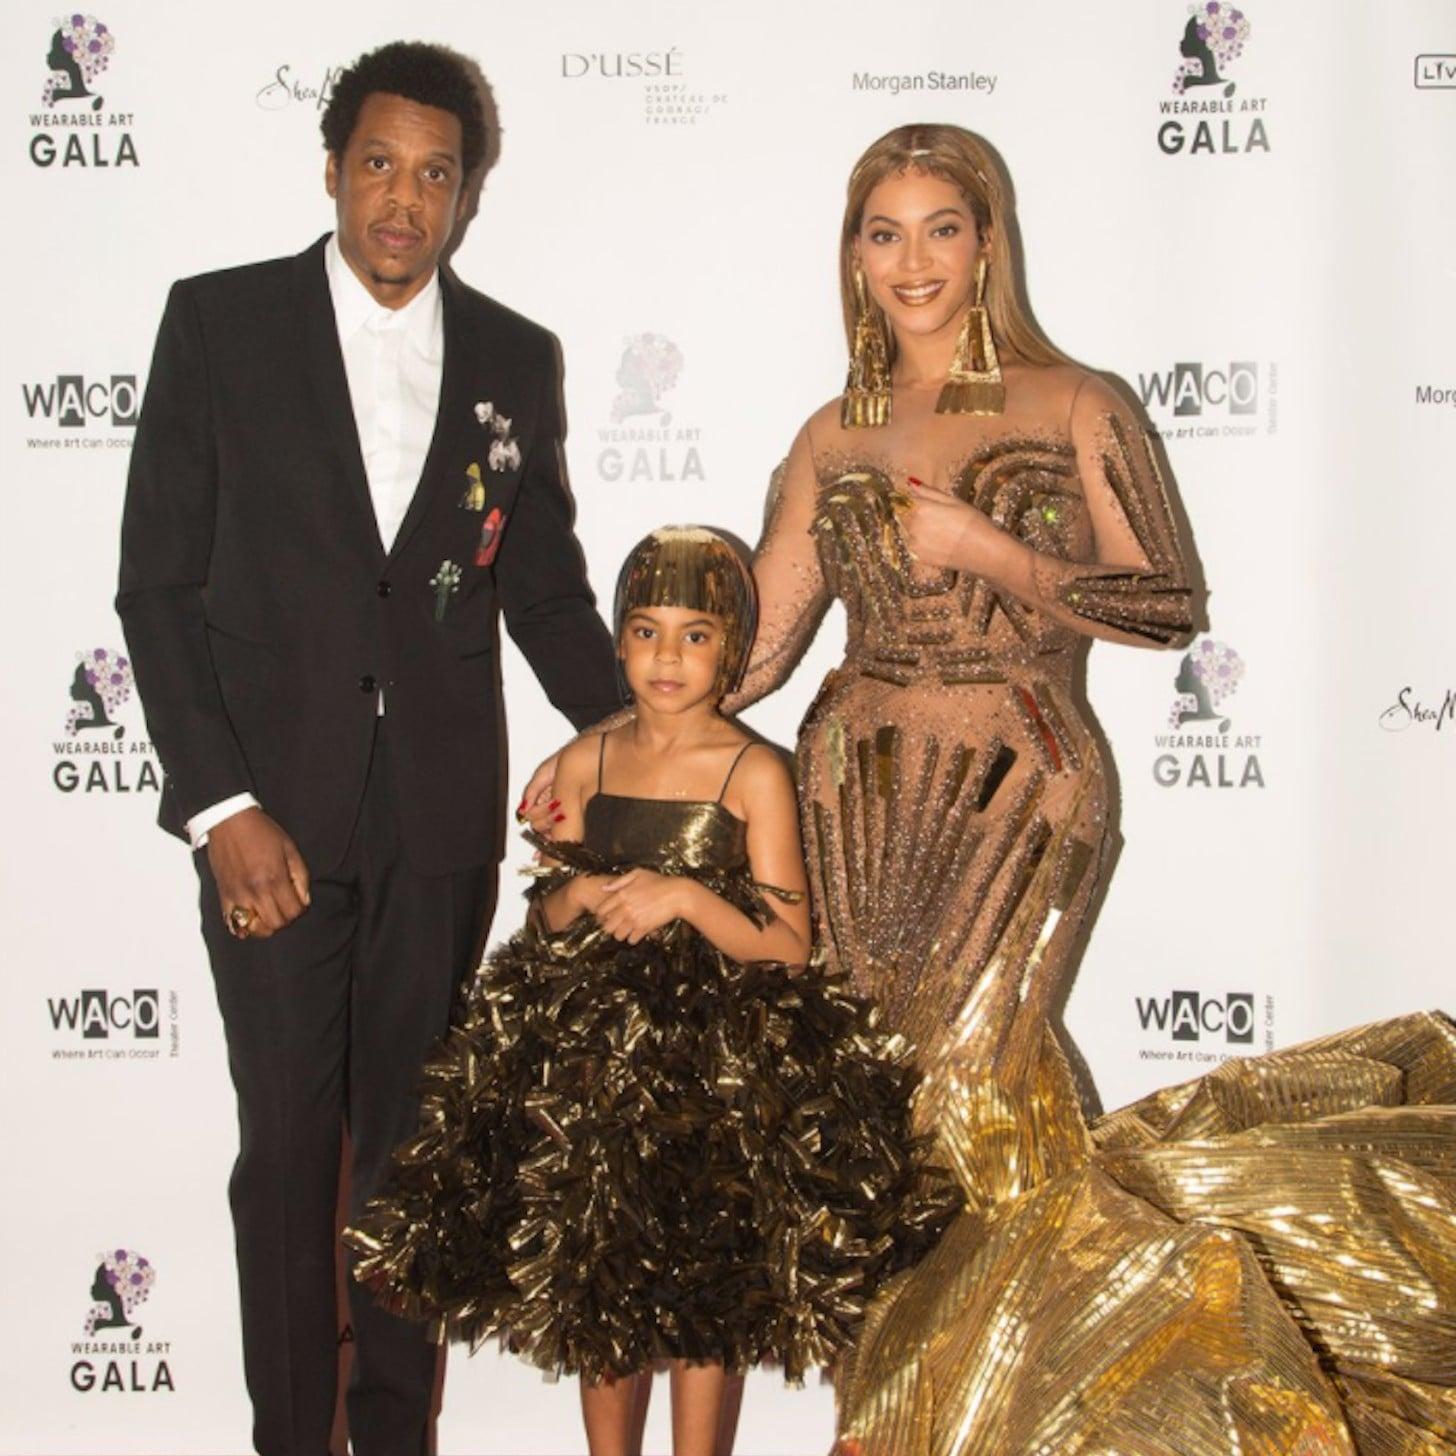 Beyoncé Wearing Gold Dress at 2018 Wearable Art Gala | POPSUGAR Fashion